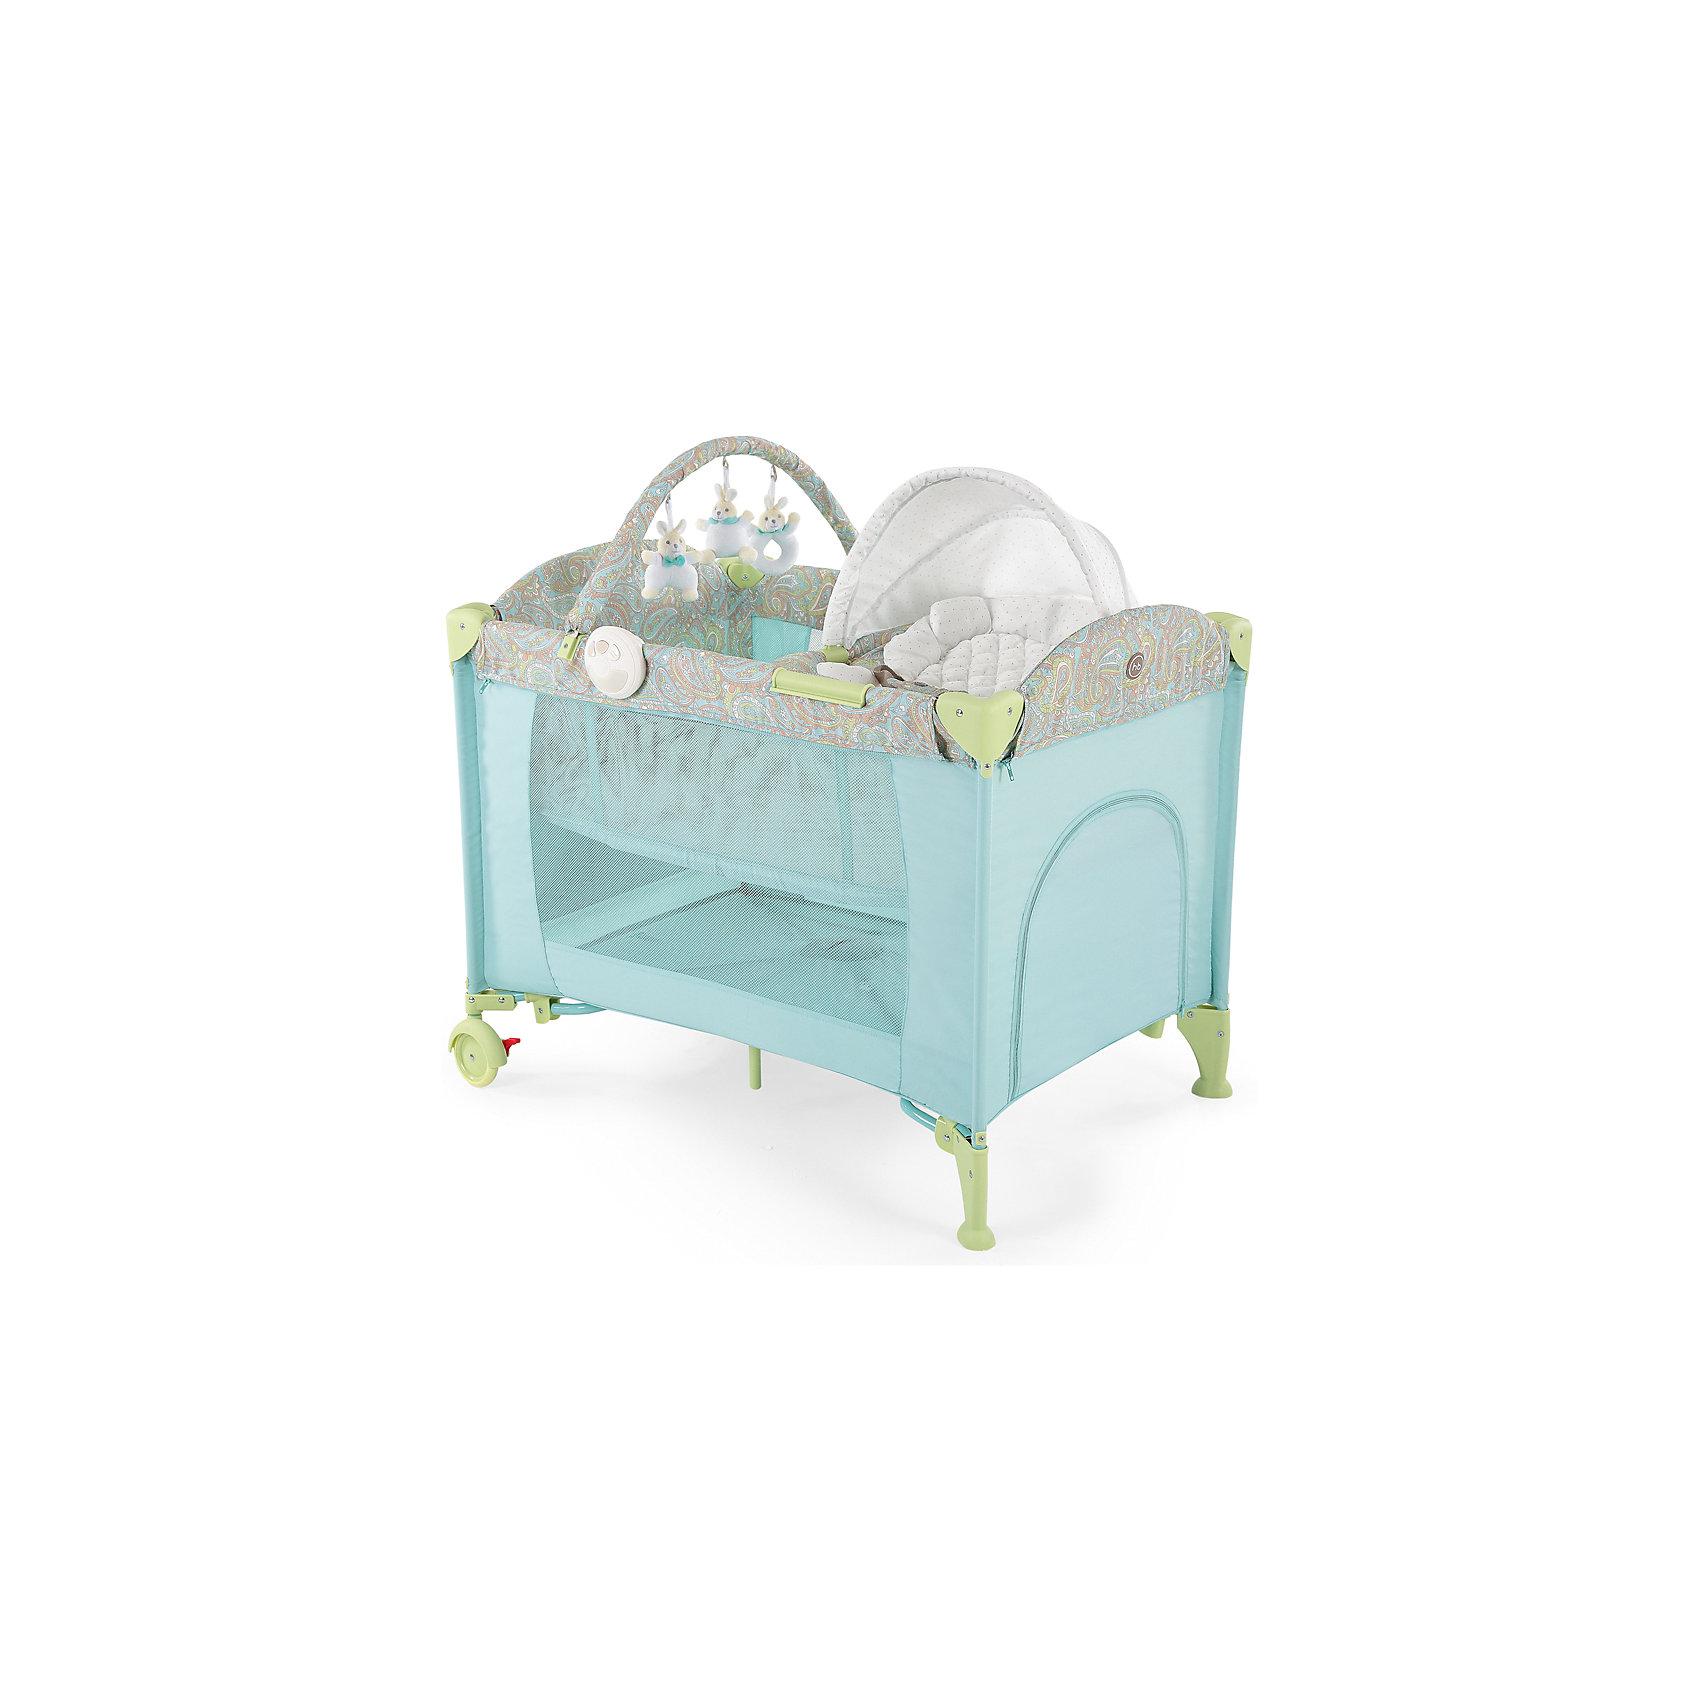 Happy Baby Кровать-манеж LAGOON V2, Happy Baby, голубой happy baby ходунки smiley v2 цвет голубой